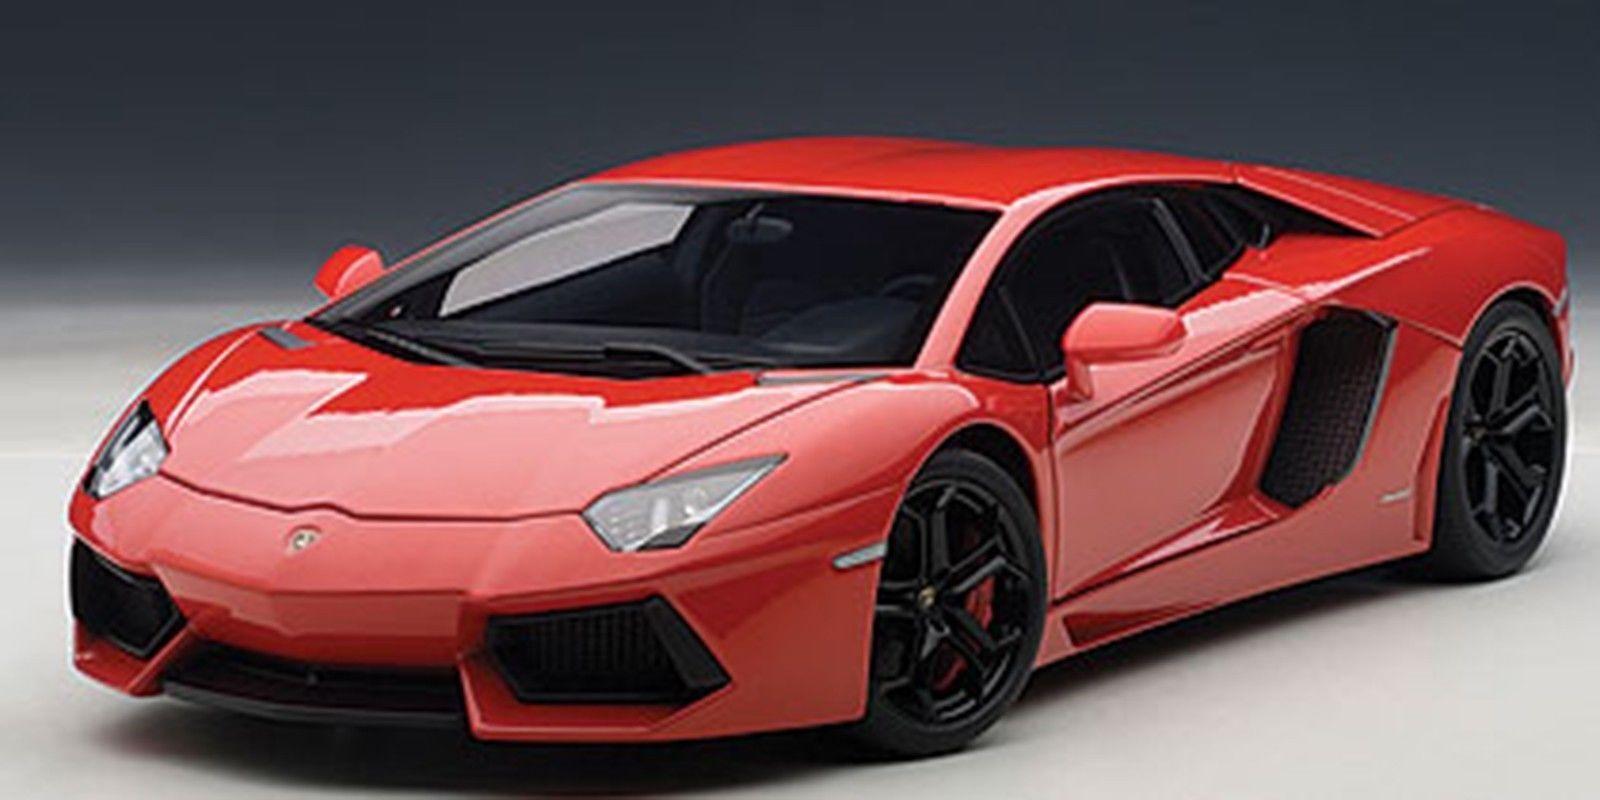 Autoart Lamborghini Aventador LP700-4 rosso-nero ruedas nero Interior 1 18  nuevo